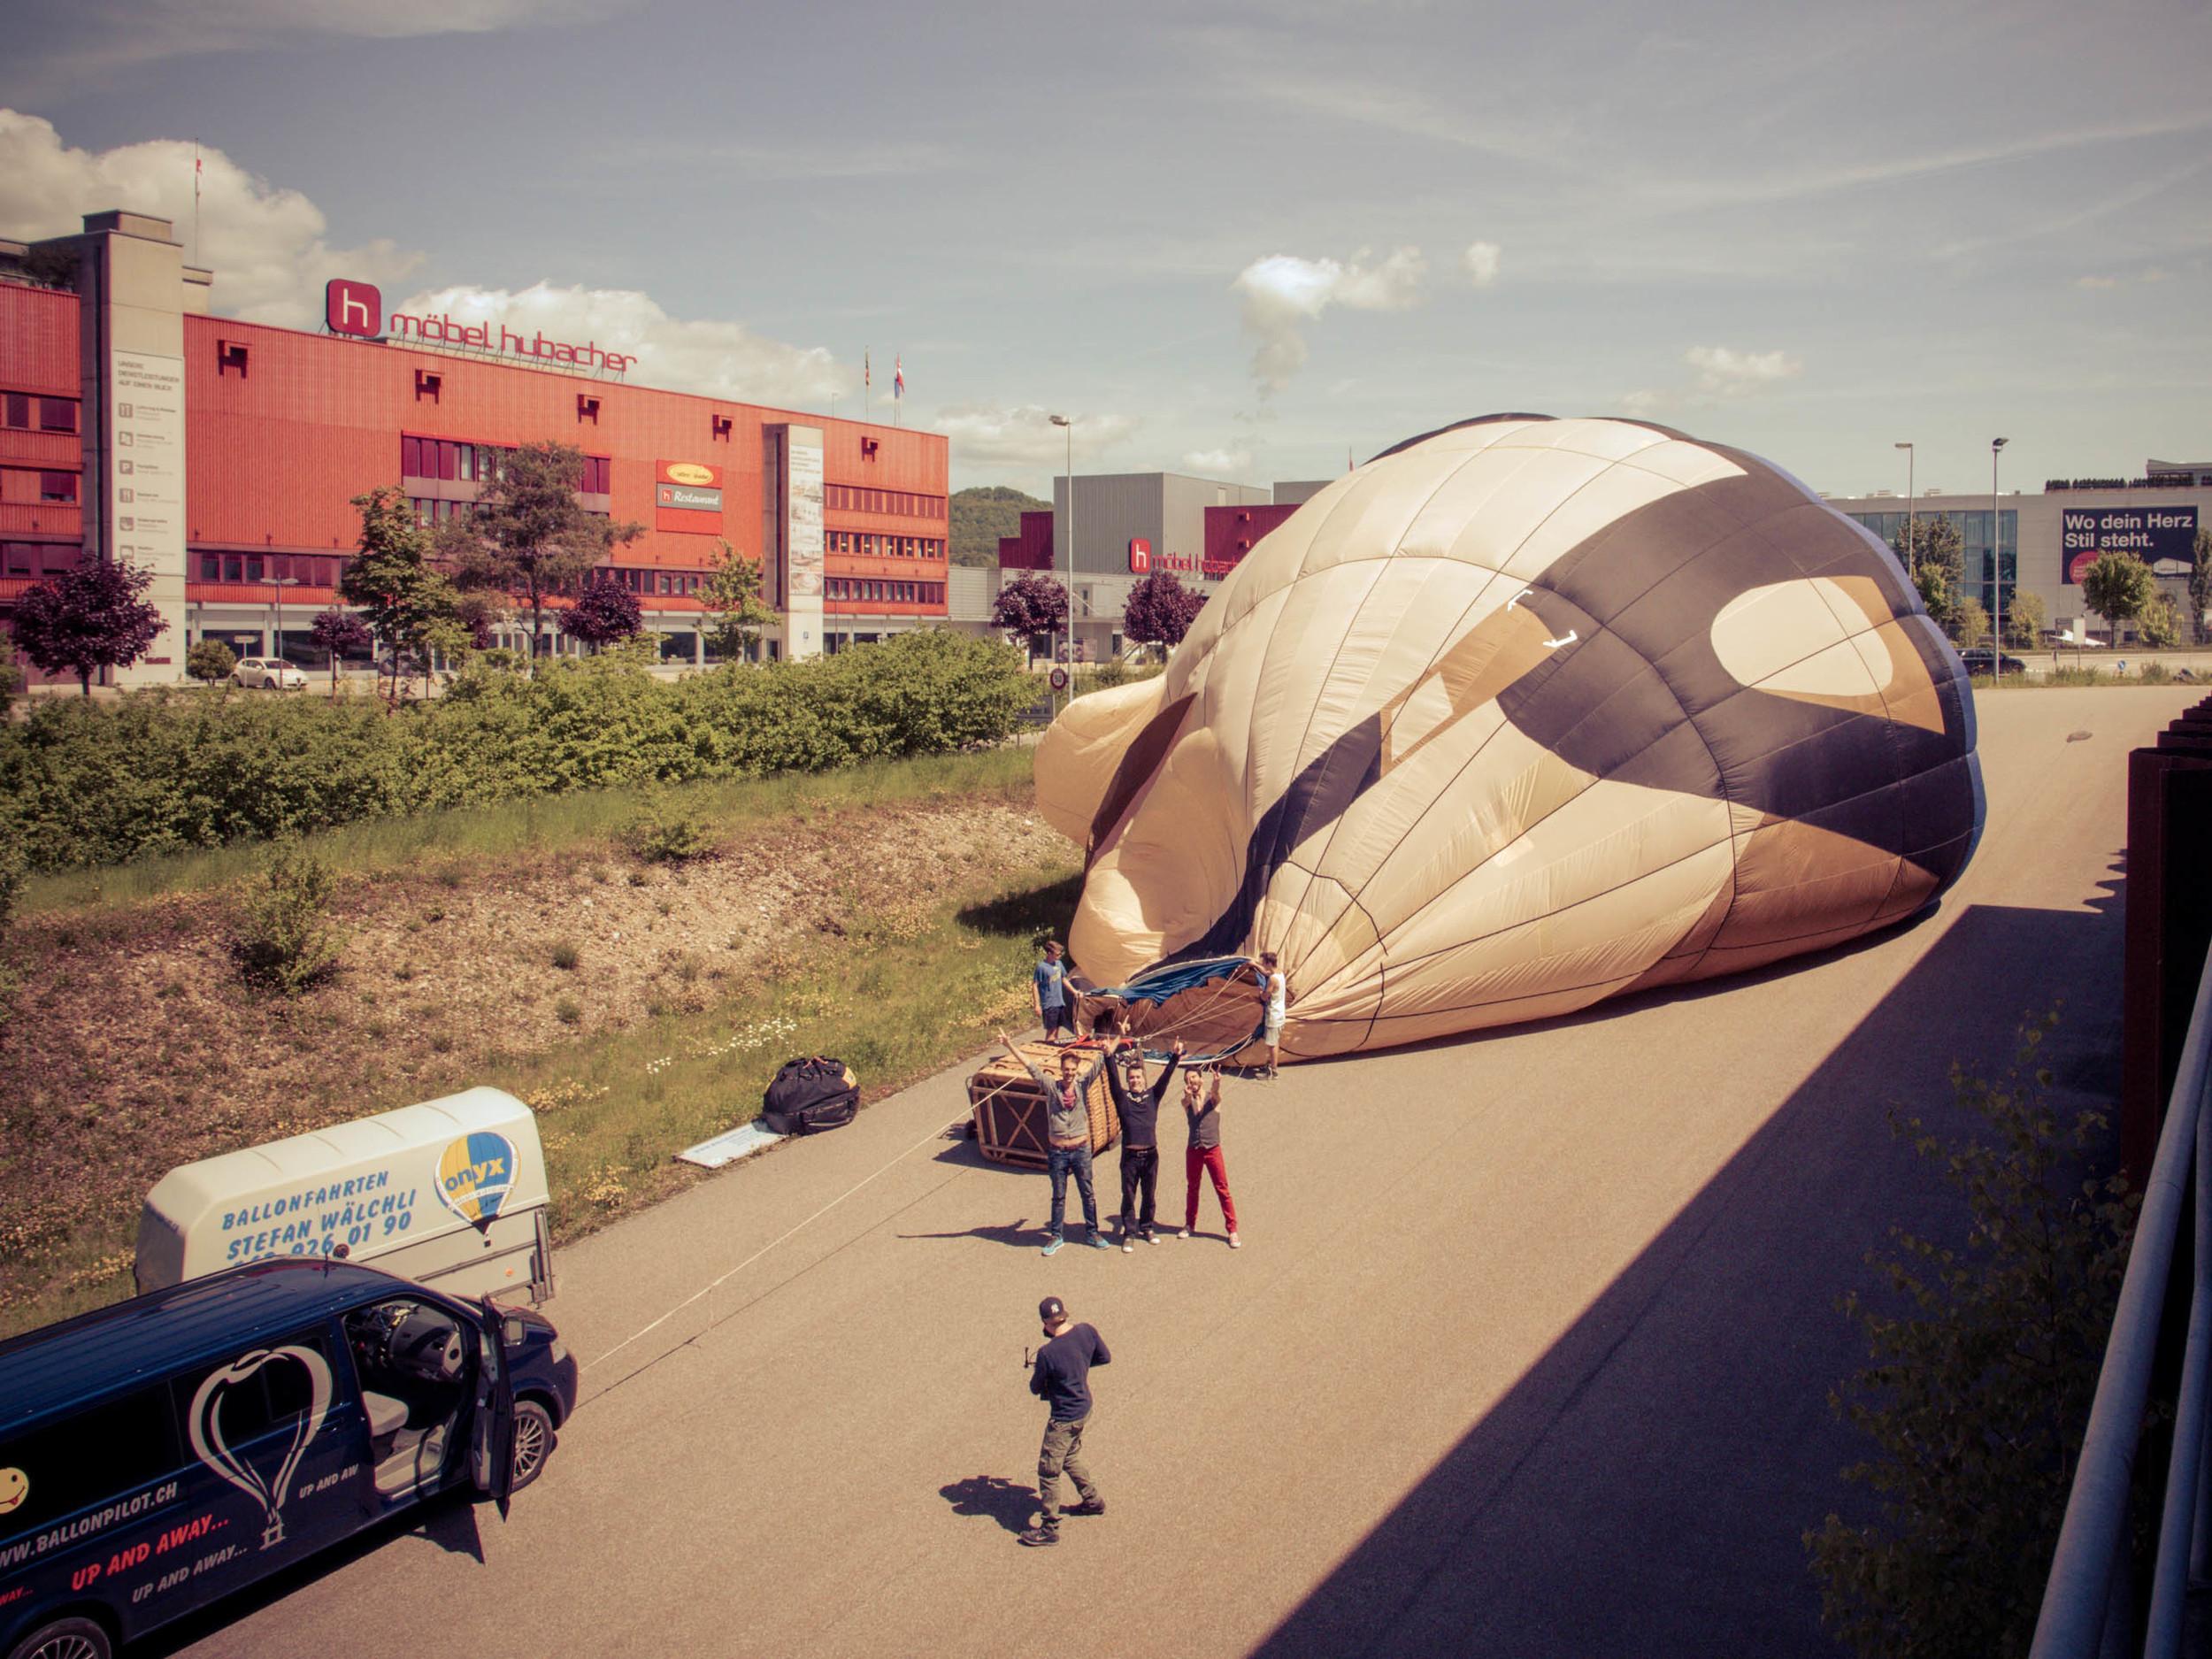 Heisslufballon_OMD-87.jpg